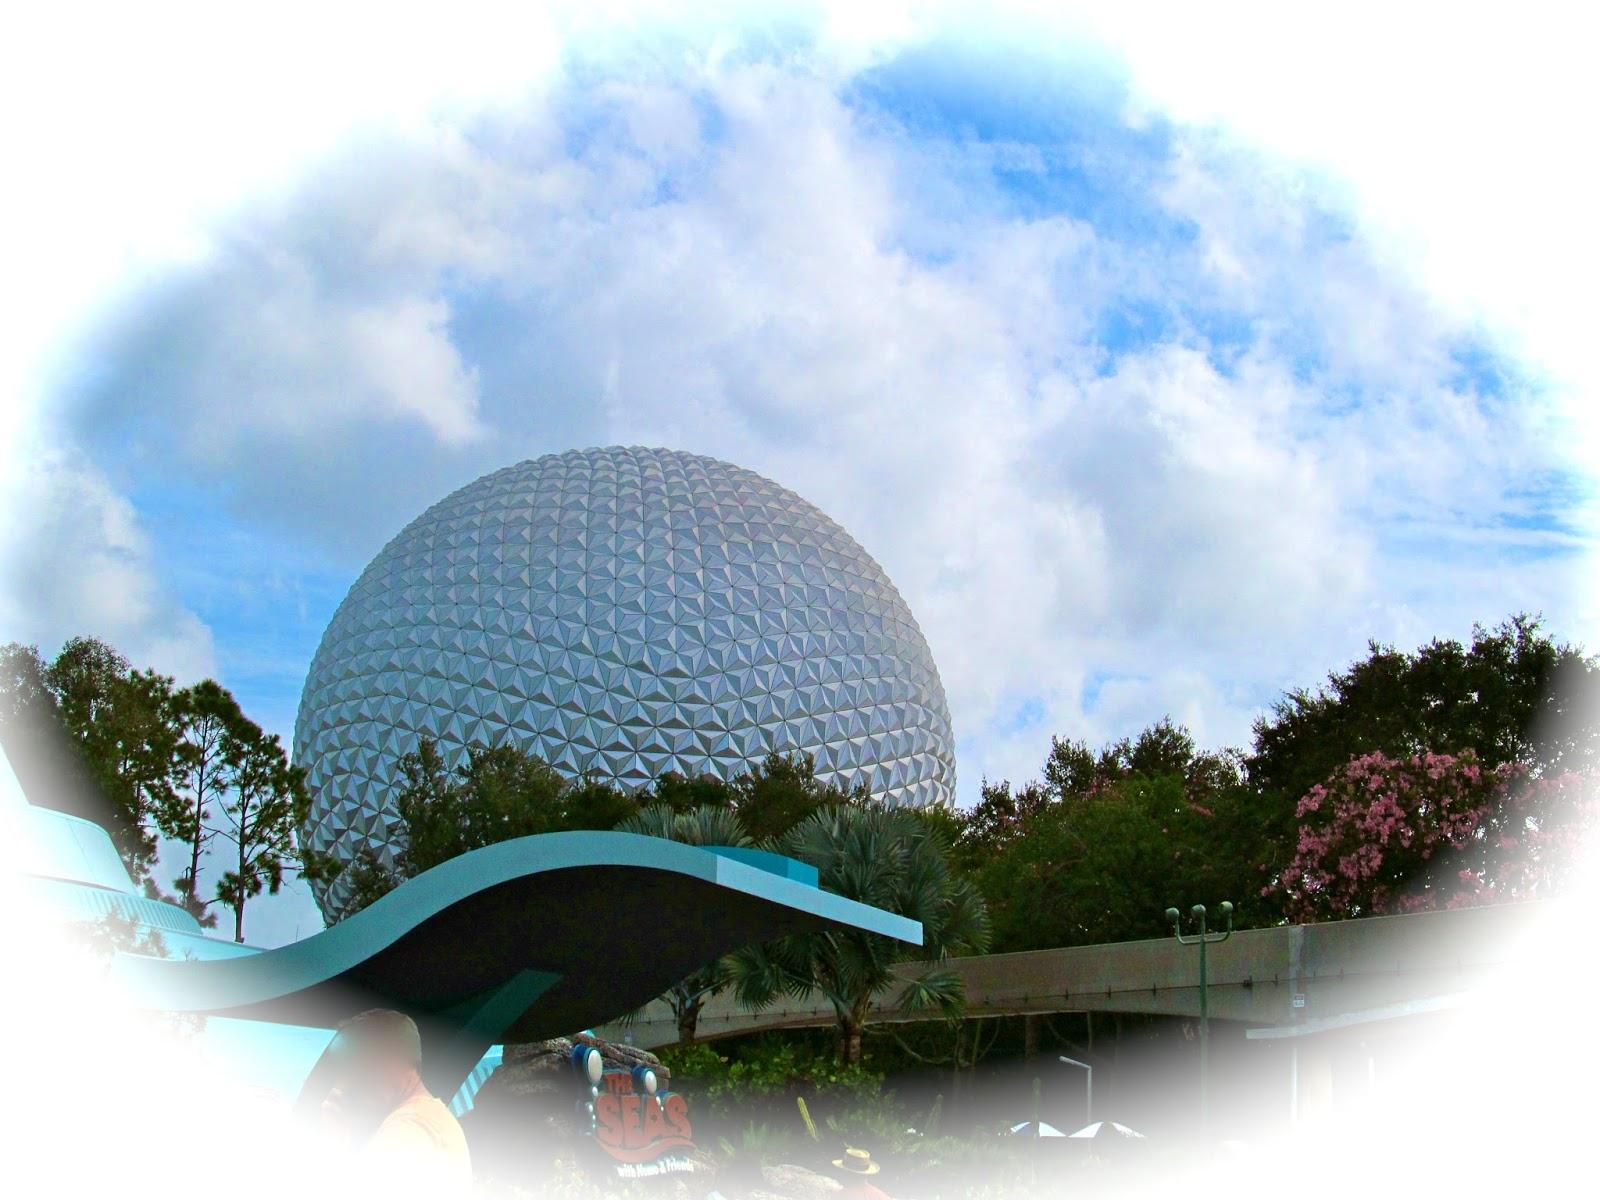 Epcot at the Walt Disney World Resort - Orlando, FL - Ouroutdoortravels.blogspot.com